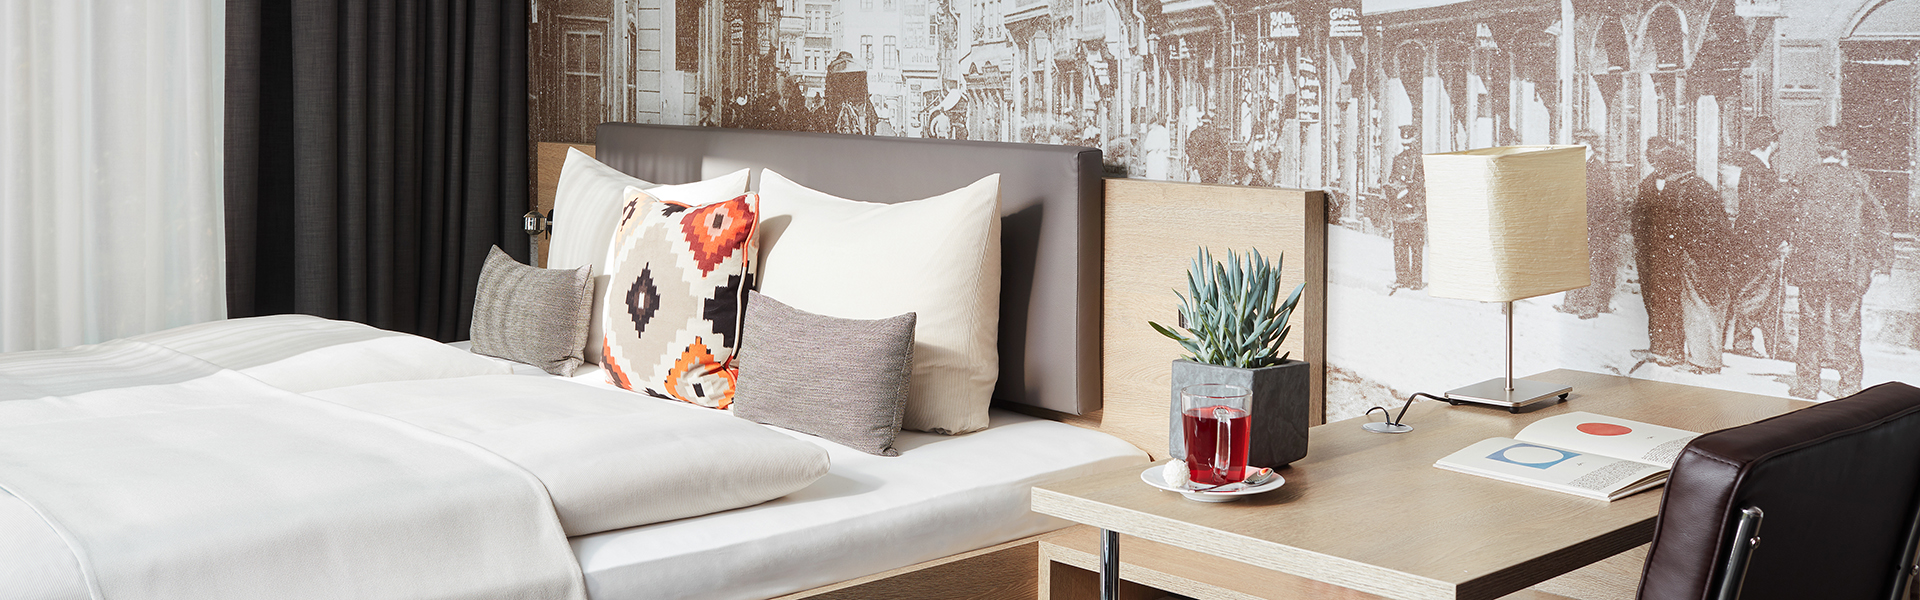 Living Hotel Frankfurt Zimmer 2